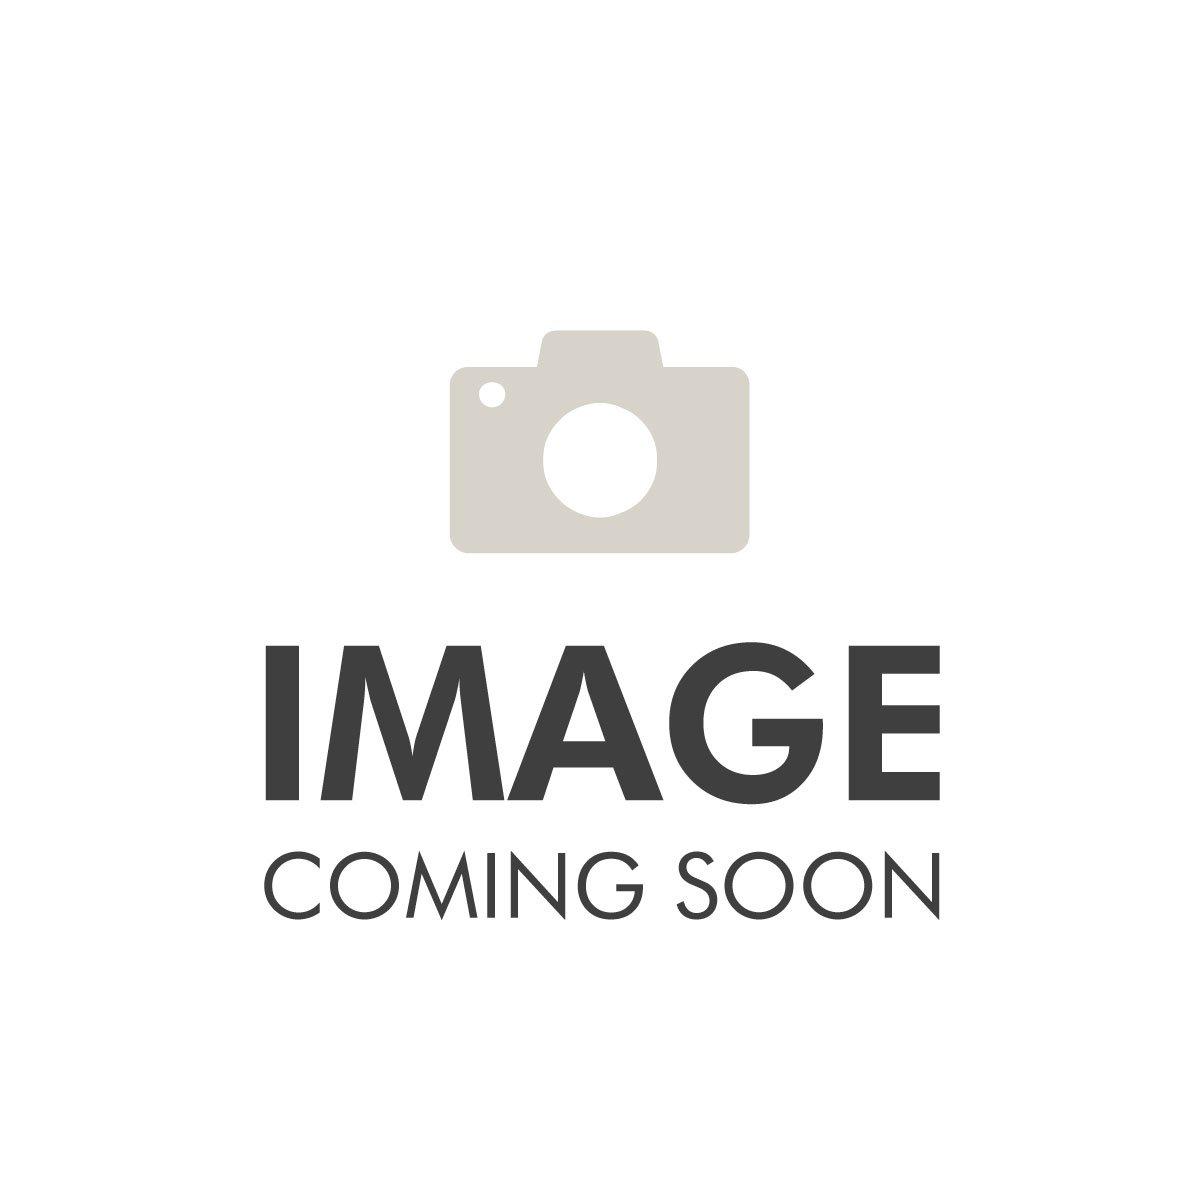 Sunkissed Eye Palette & Bronzer Set - Smoky Eyes 11 Pieces